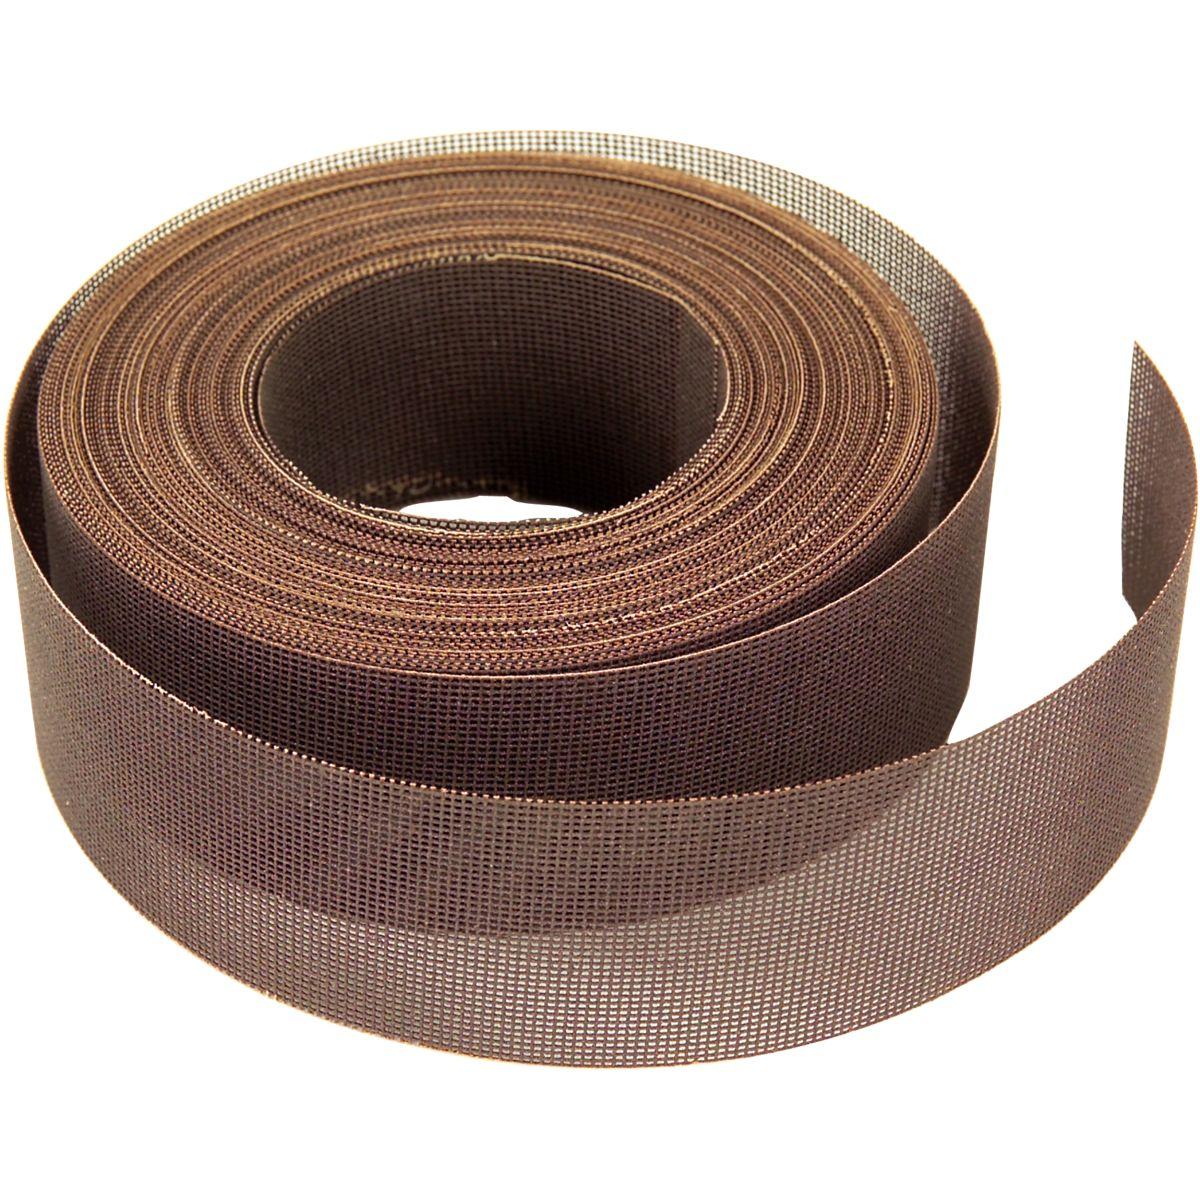 "1-1/2"" x 25 yds. 120 Grit Screen Cloth Roll"